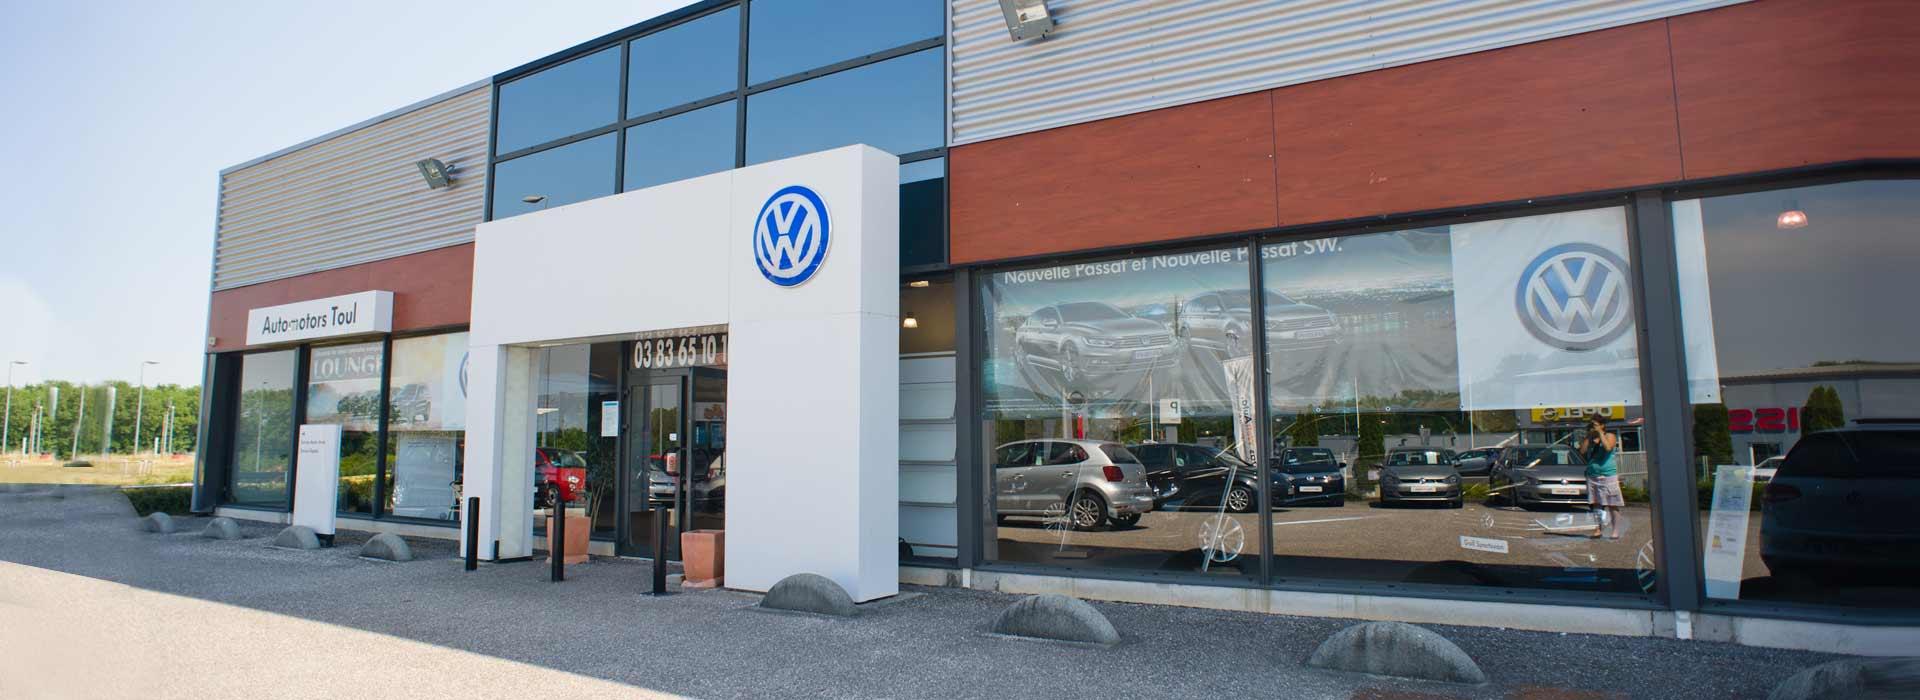 Volkswagen Dommartin-Les-Toul - Nancy